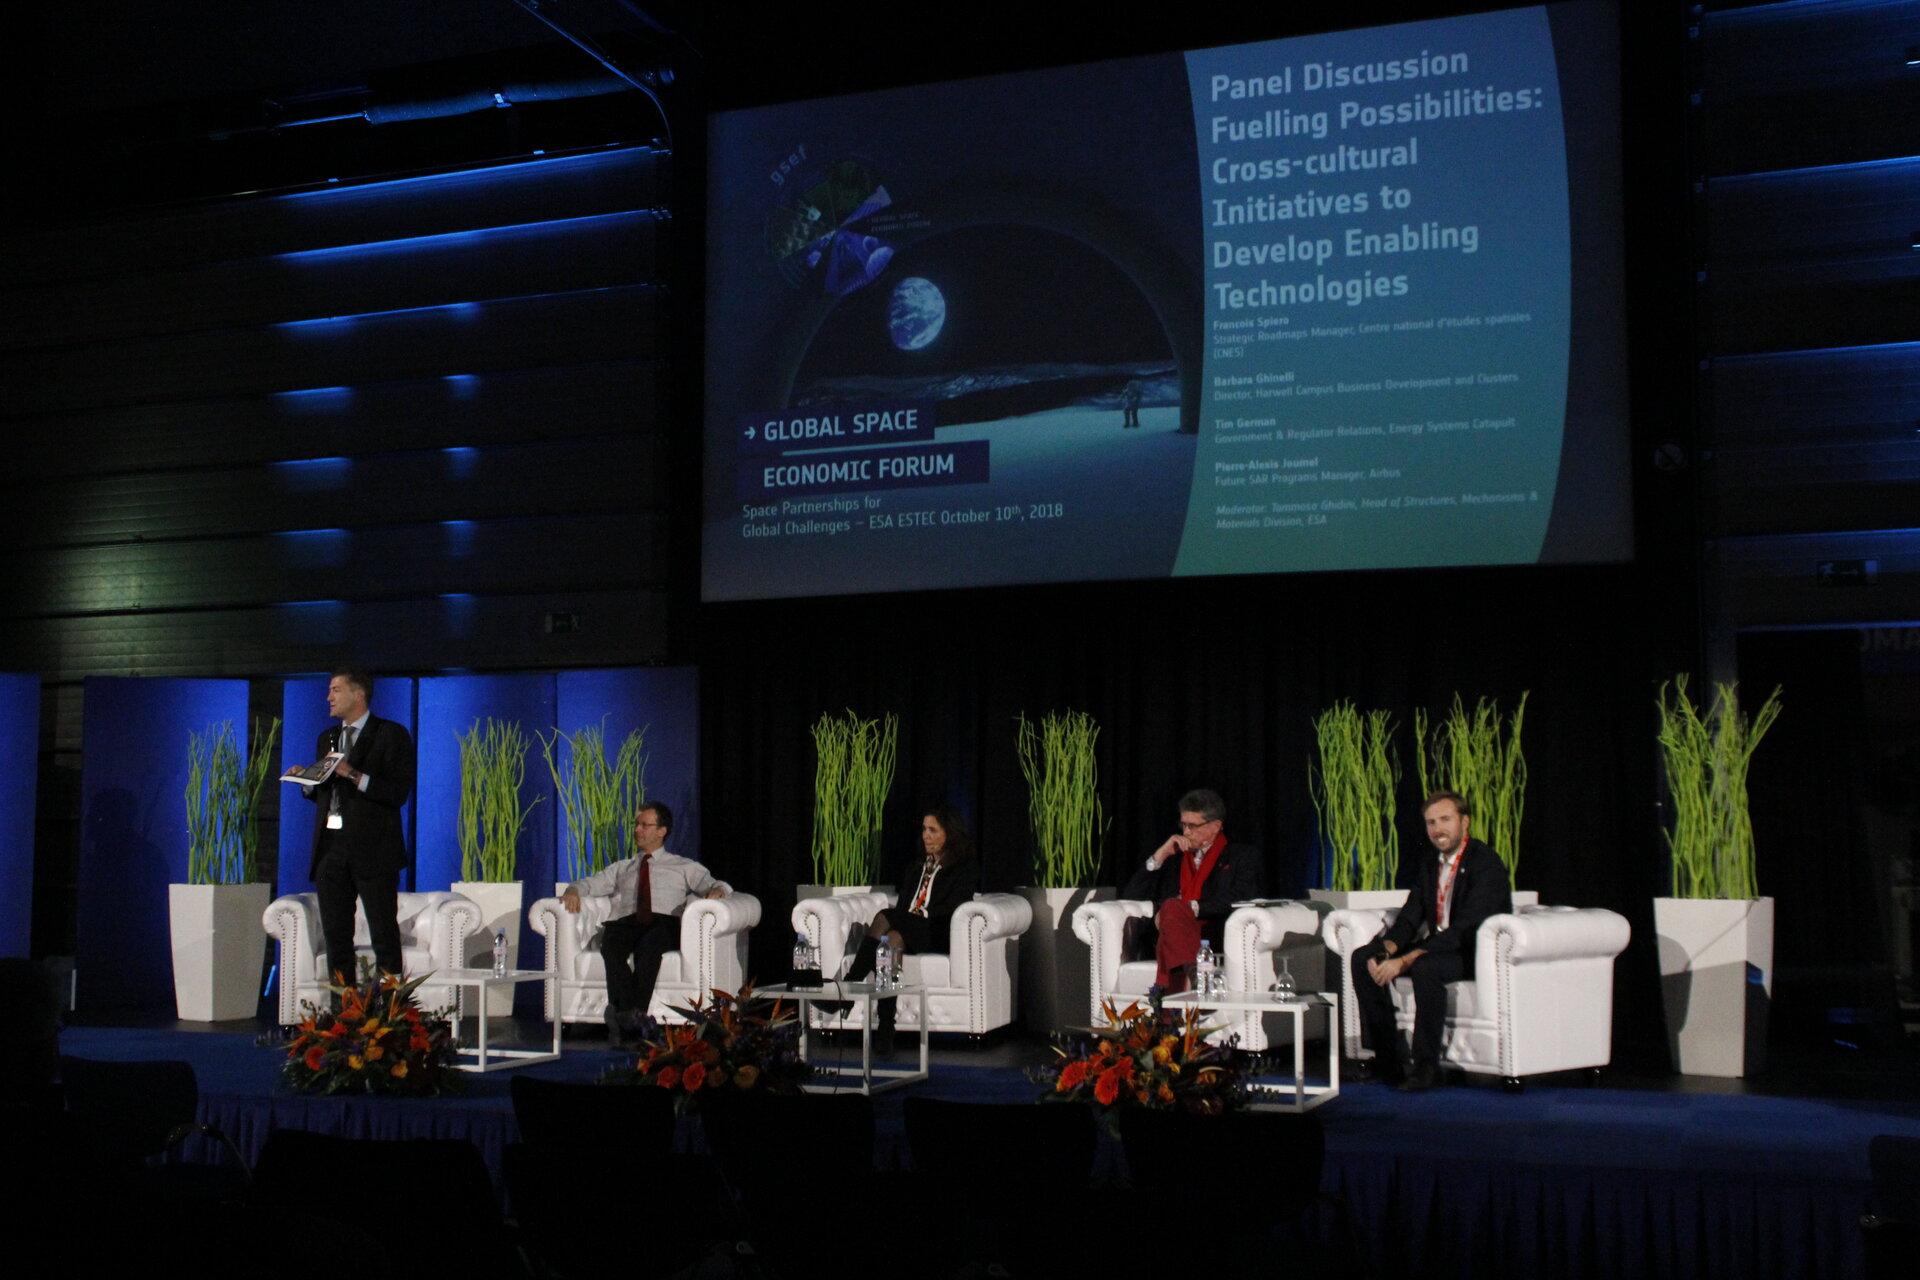 Global Space Economic Forum